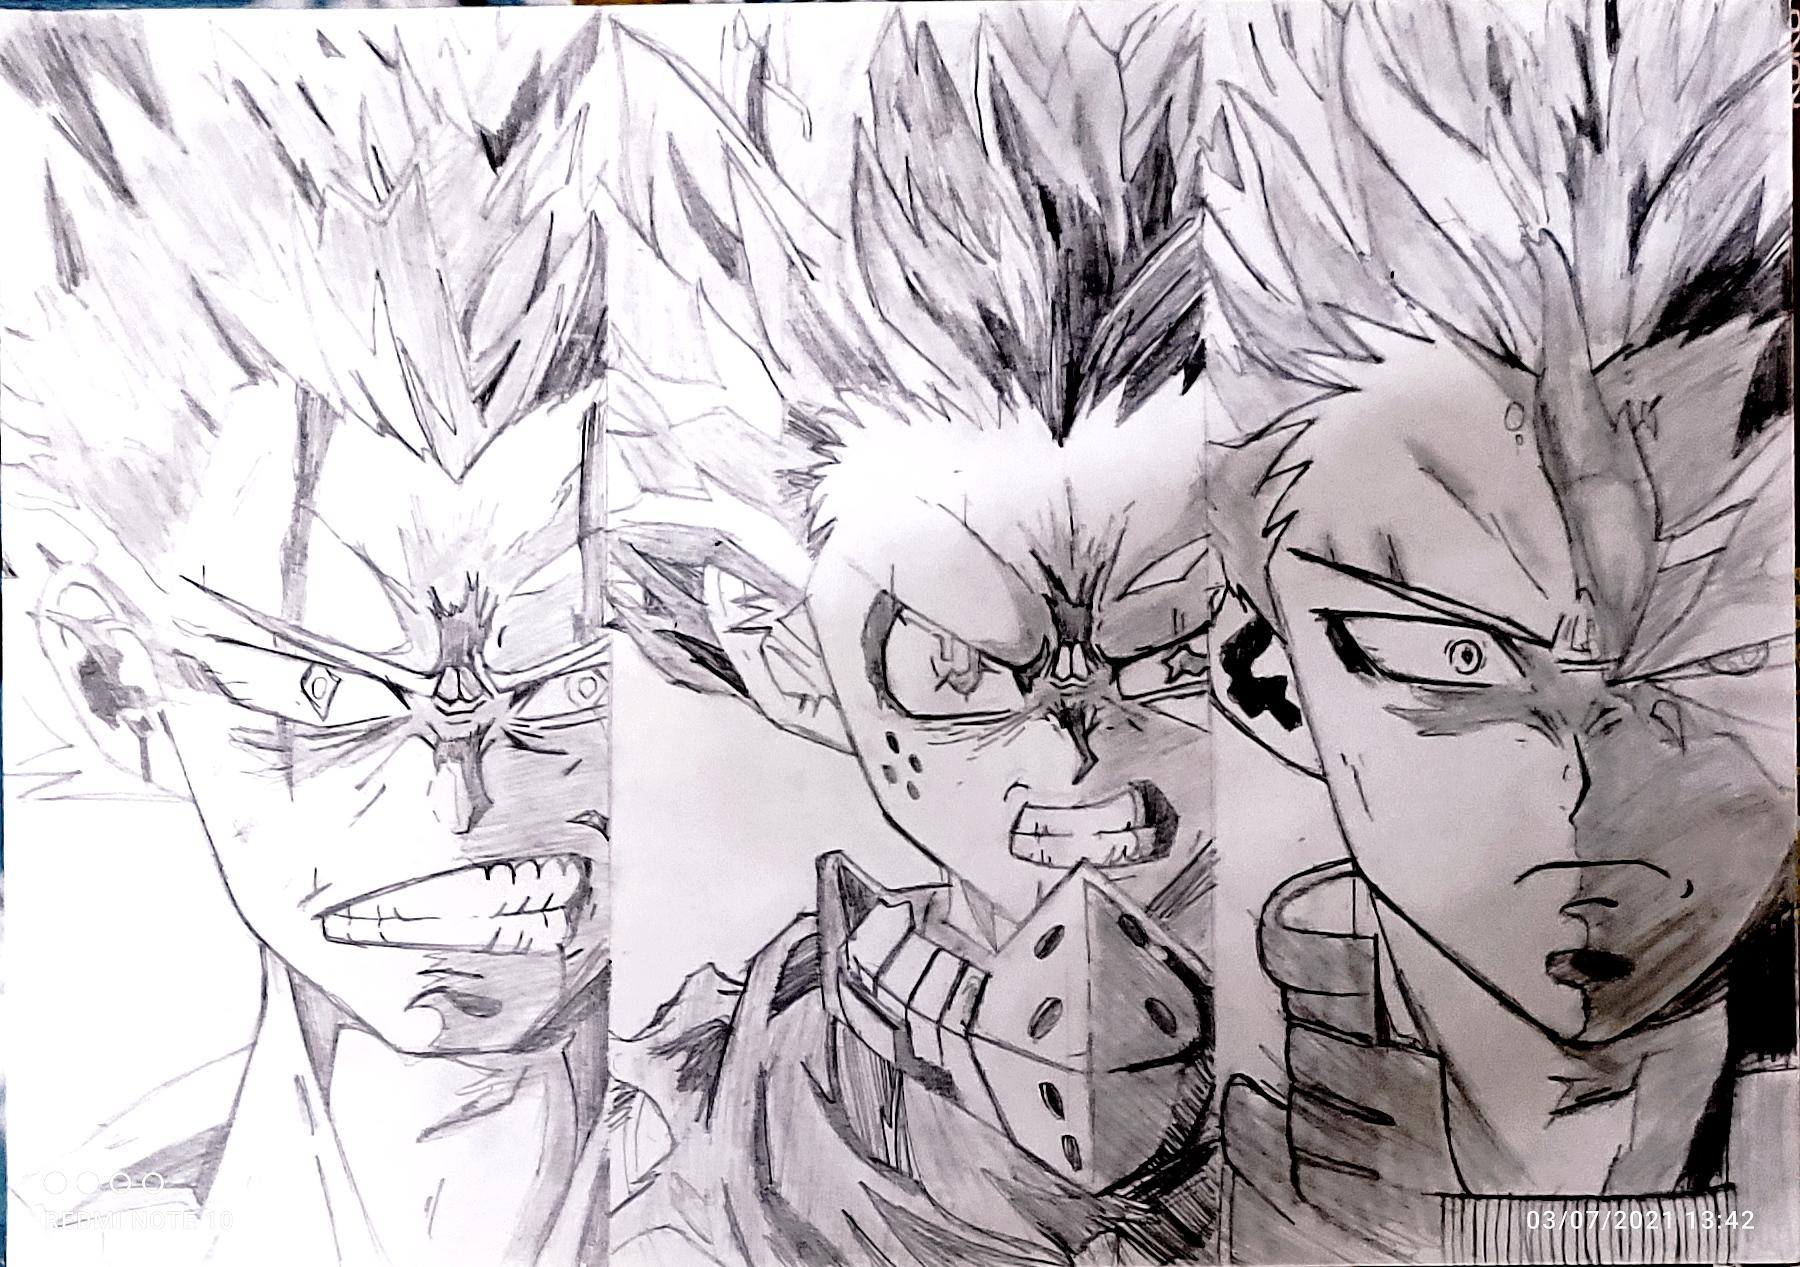 Charitharth's Pencil Art Of Manga Heroes